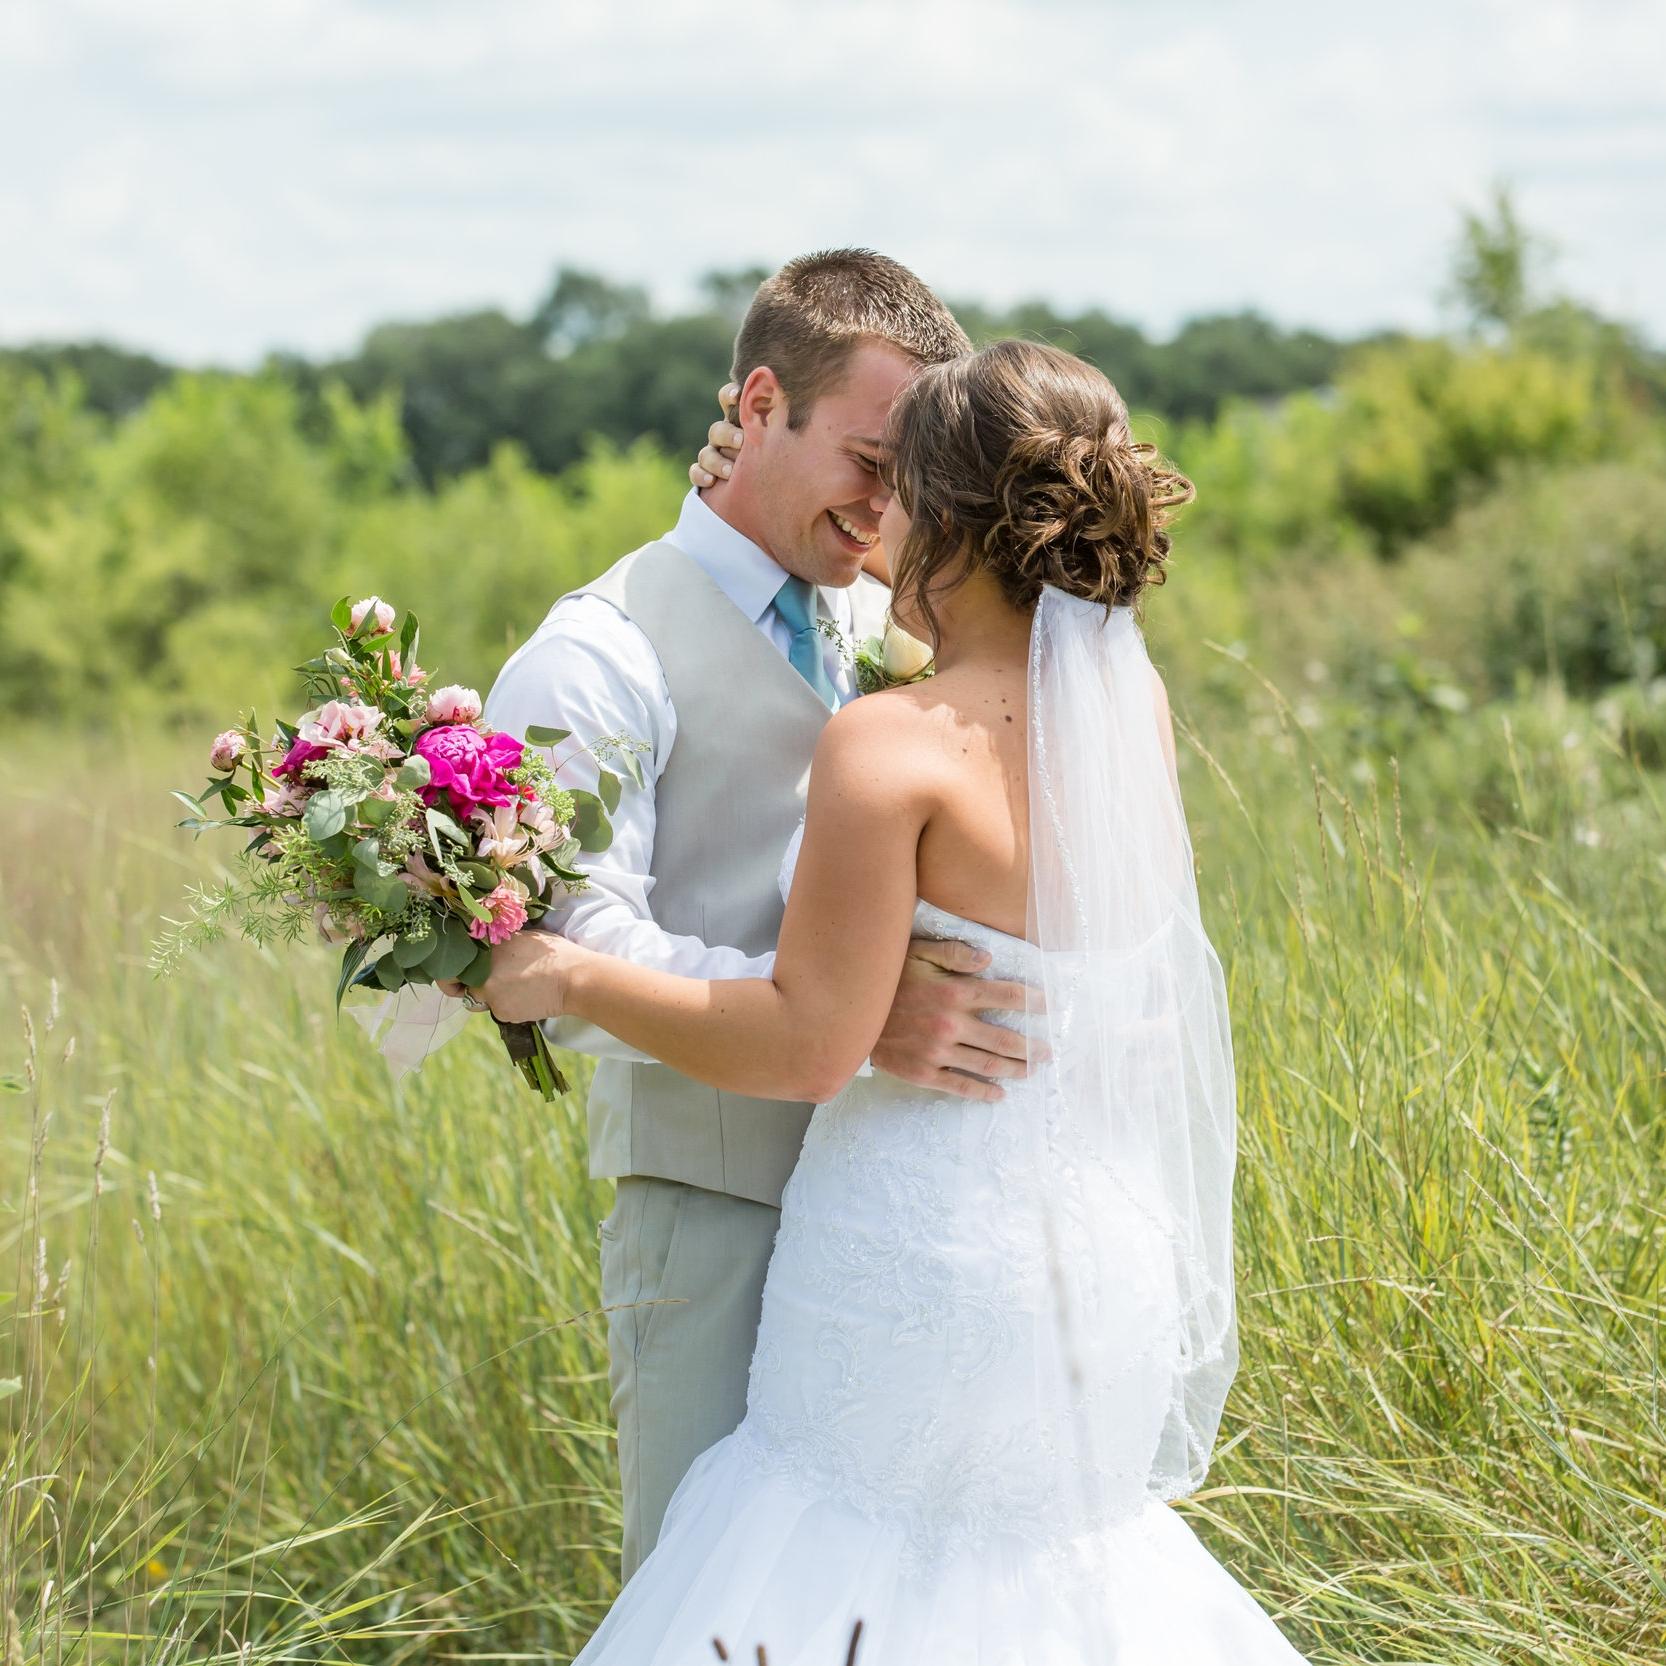 Kim Dyer Photography - Omaha / Surrounding Areas    Kim Dyer